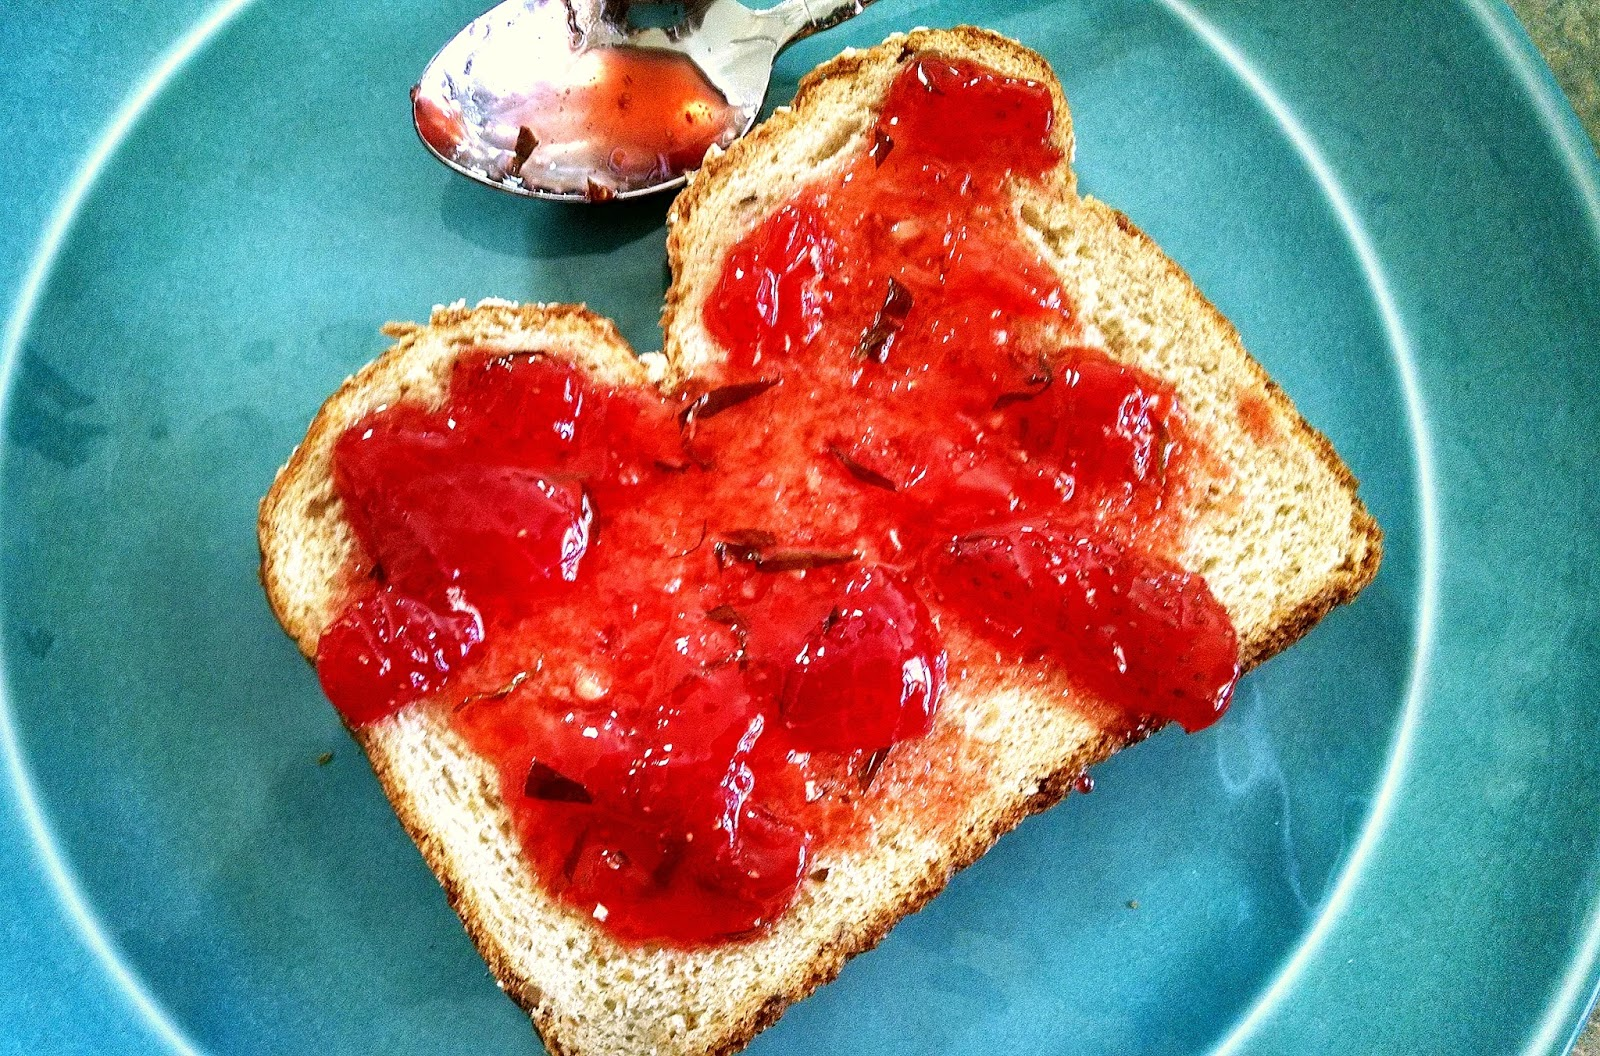 thistlebear: Tarragon strawberry jam